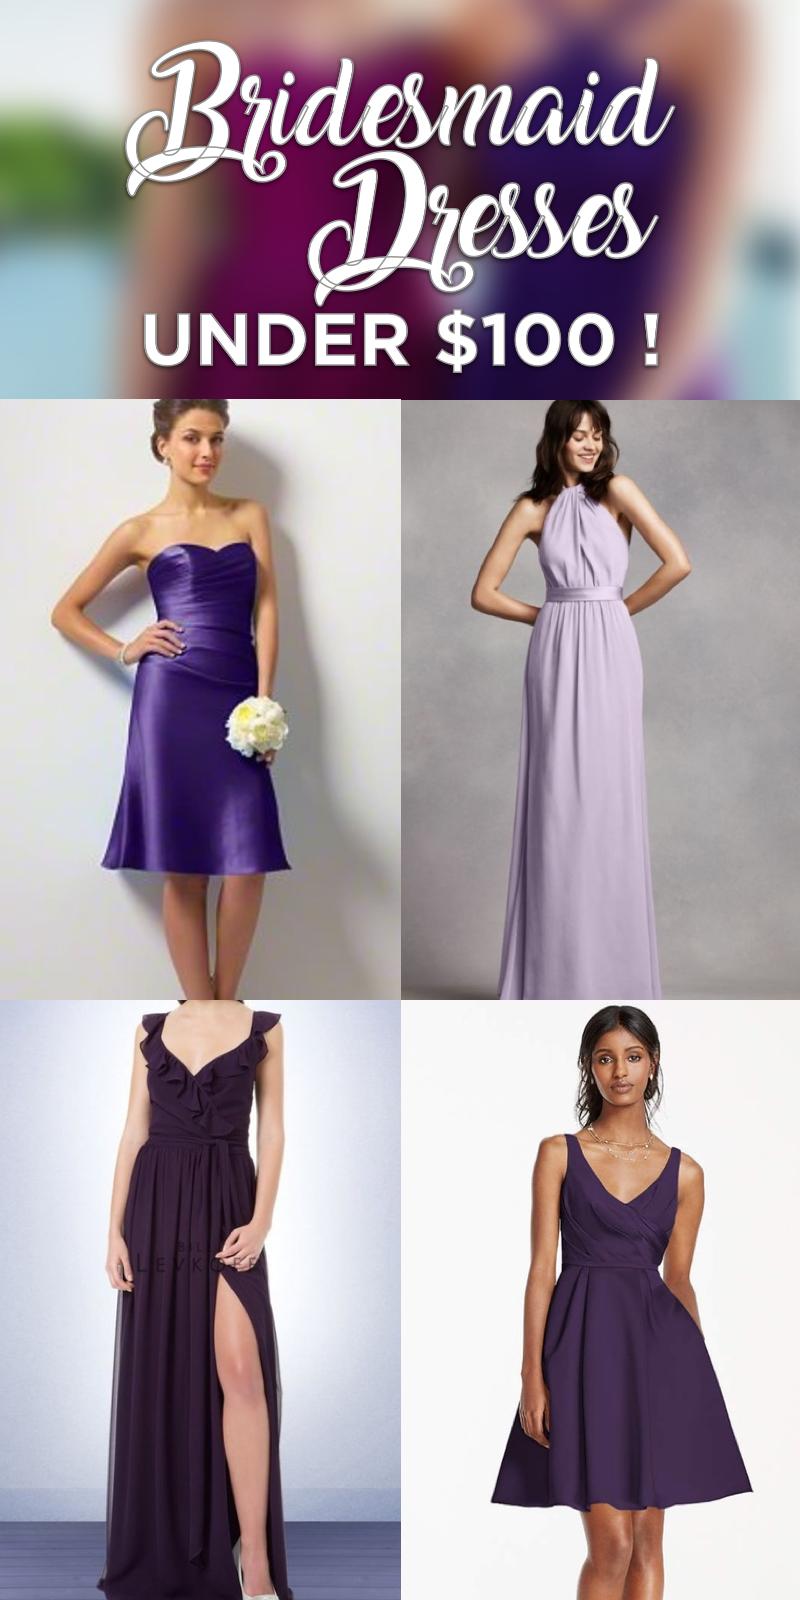 Bridesmaid dresses under 100 list an item or make an offer buy bridesmaid dresses under 100 list an item or make an offer buy sell ombrellifo Images